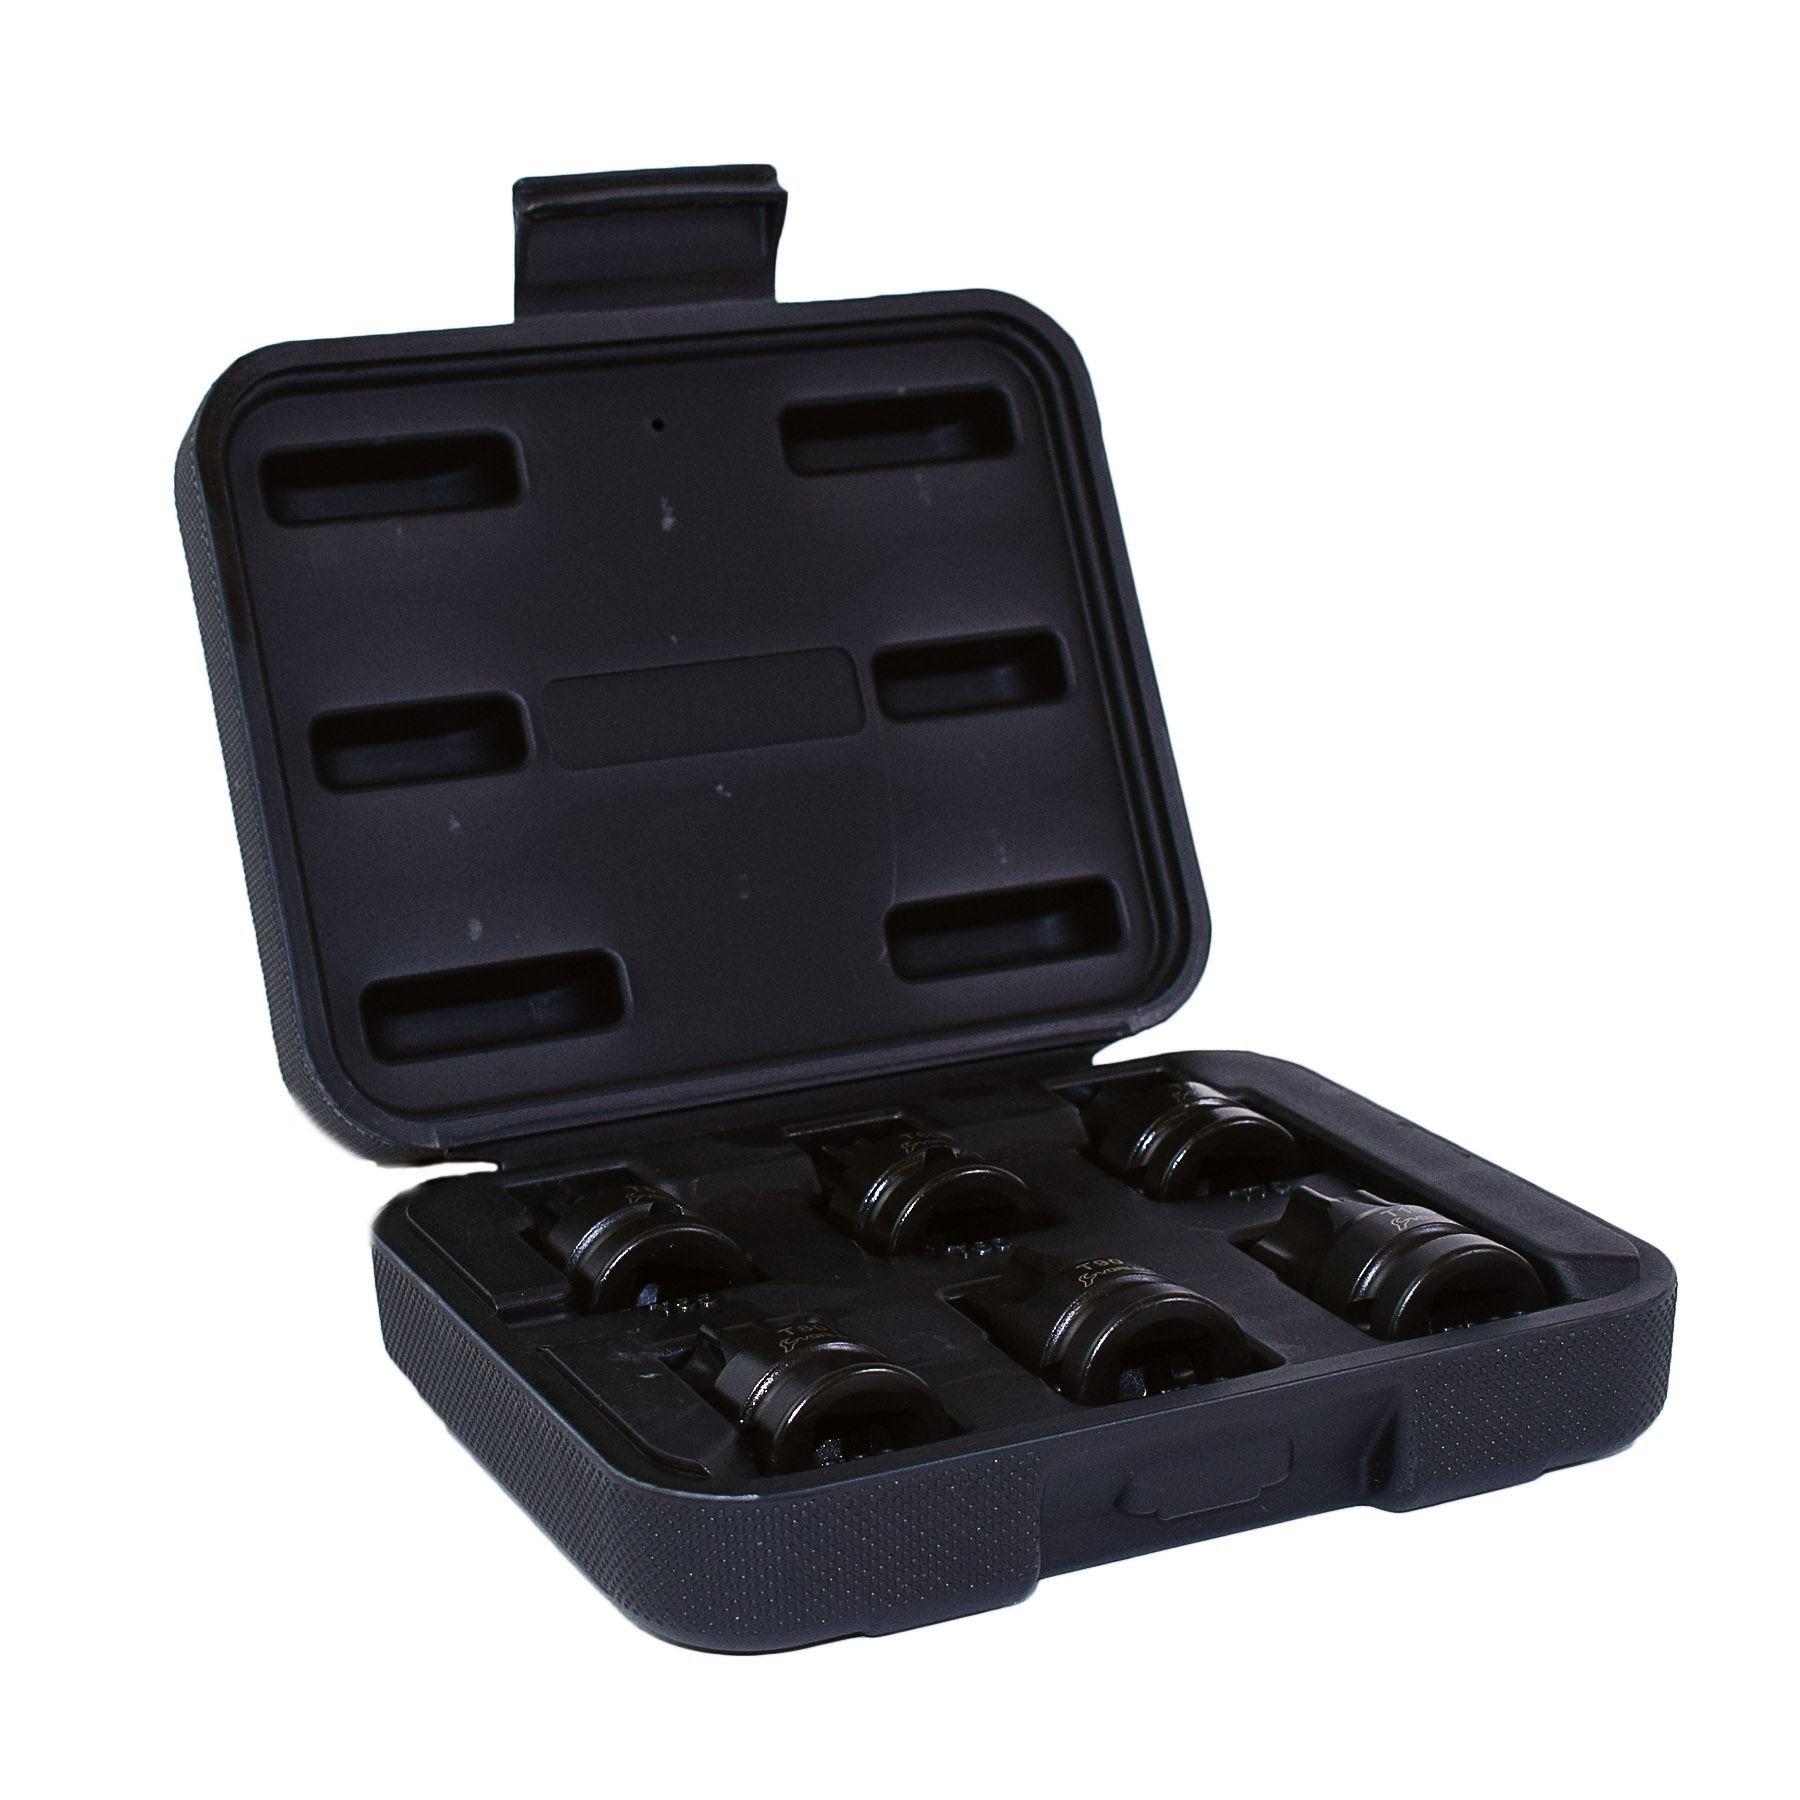 Impact 1/2'' Drive Shallow Stubby Torx Star Male Bit Sockets T55 - T100 6pc Set by AB Tools-US Pro